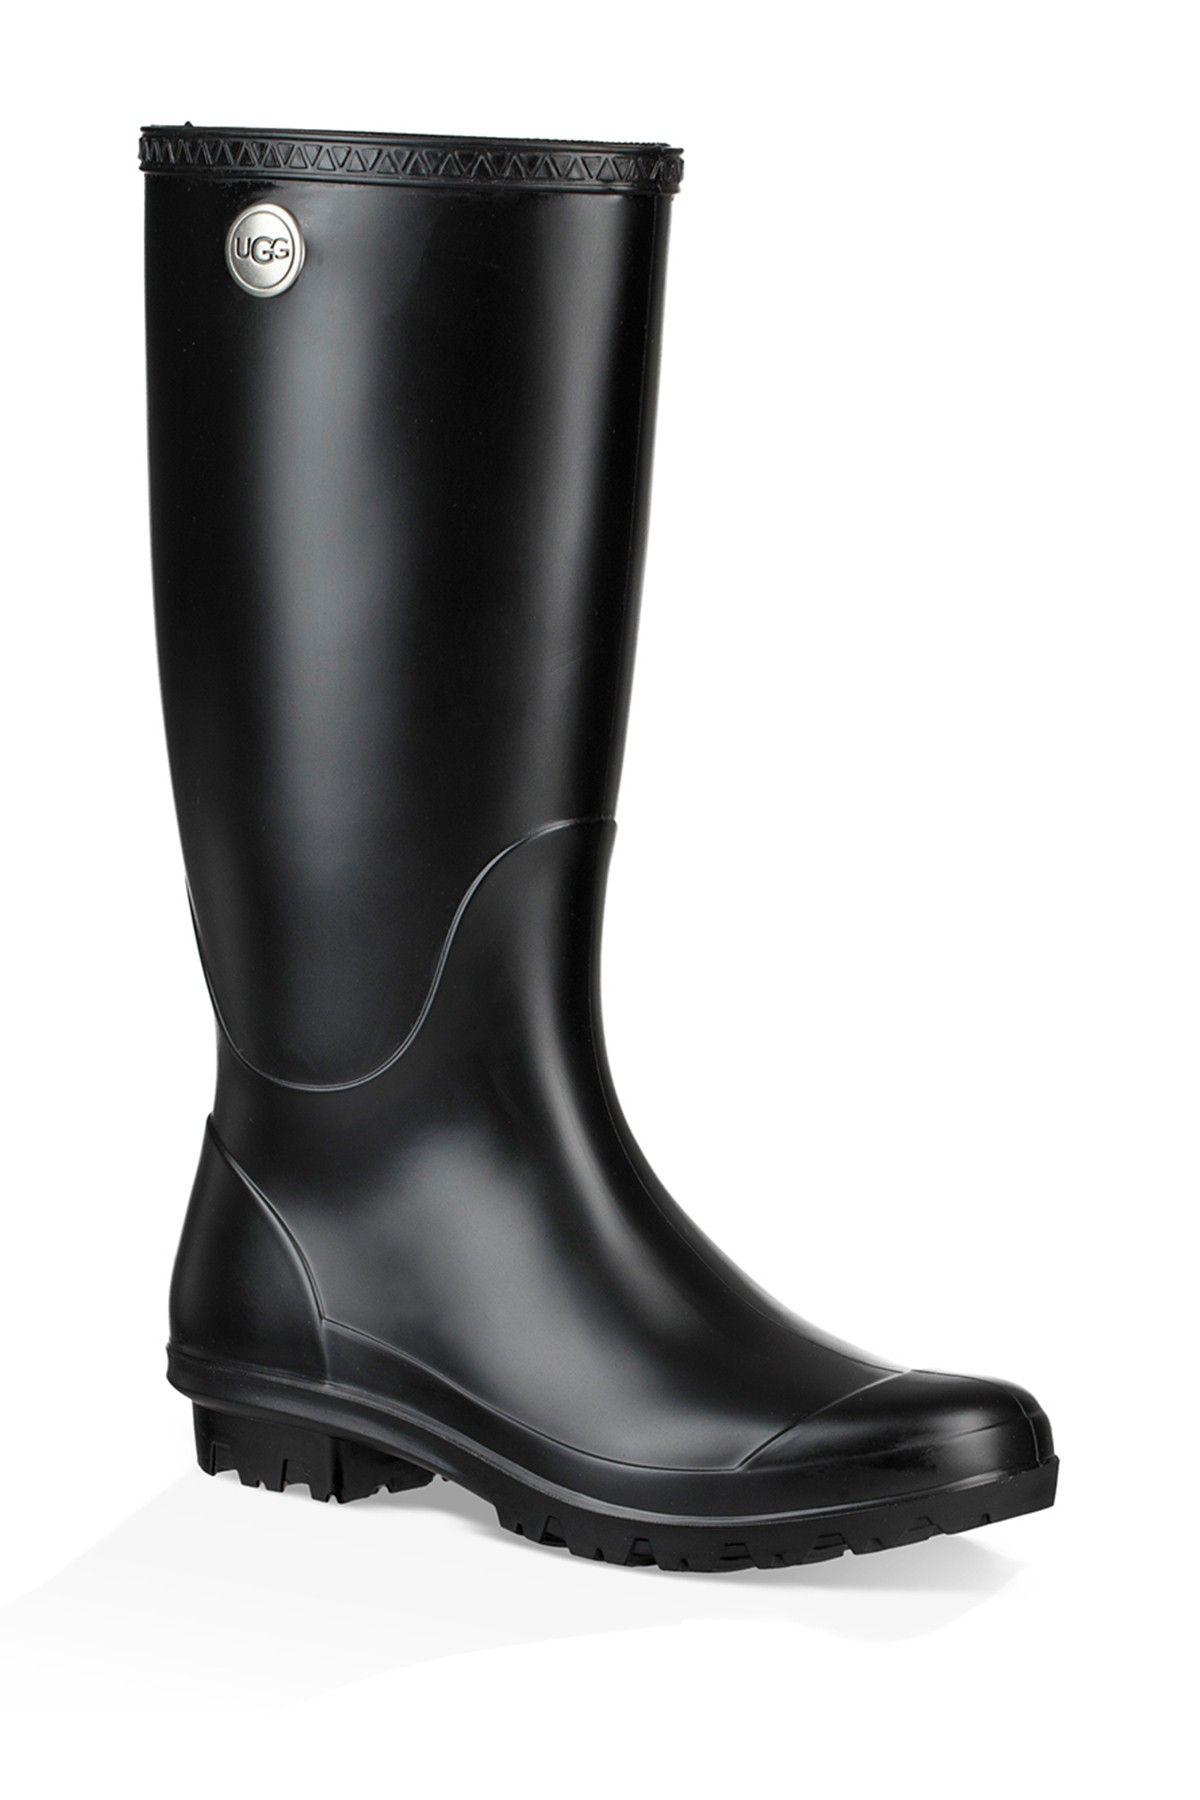 Shelby Matte Rain Boots